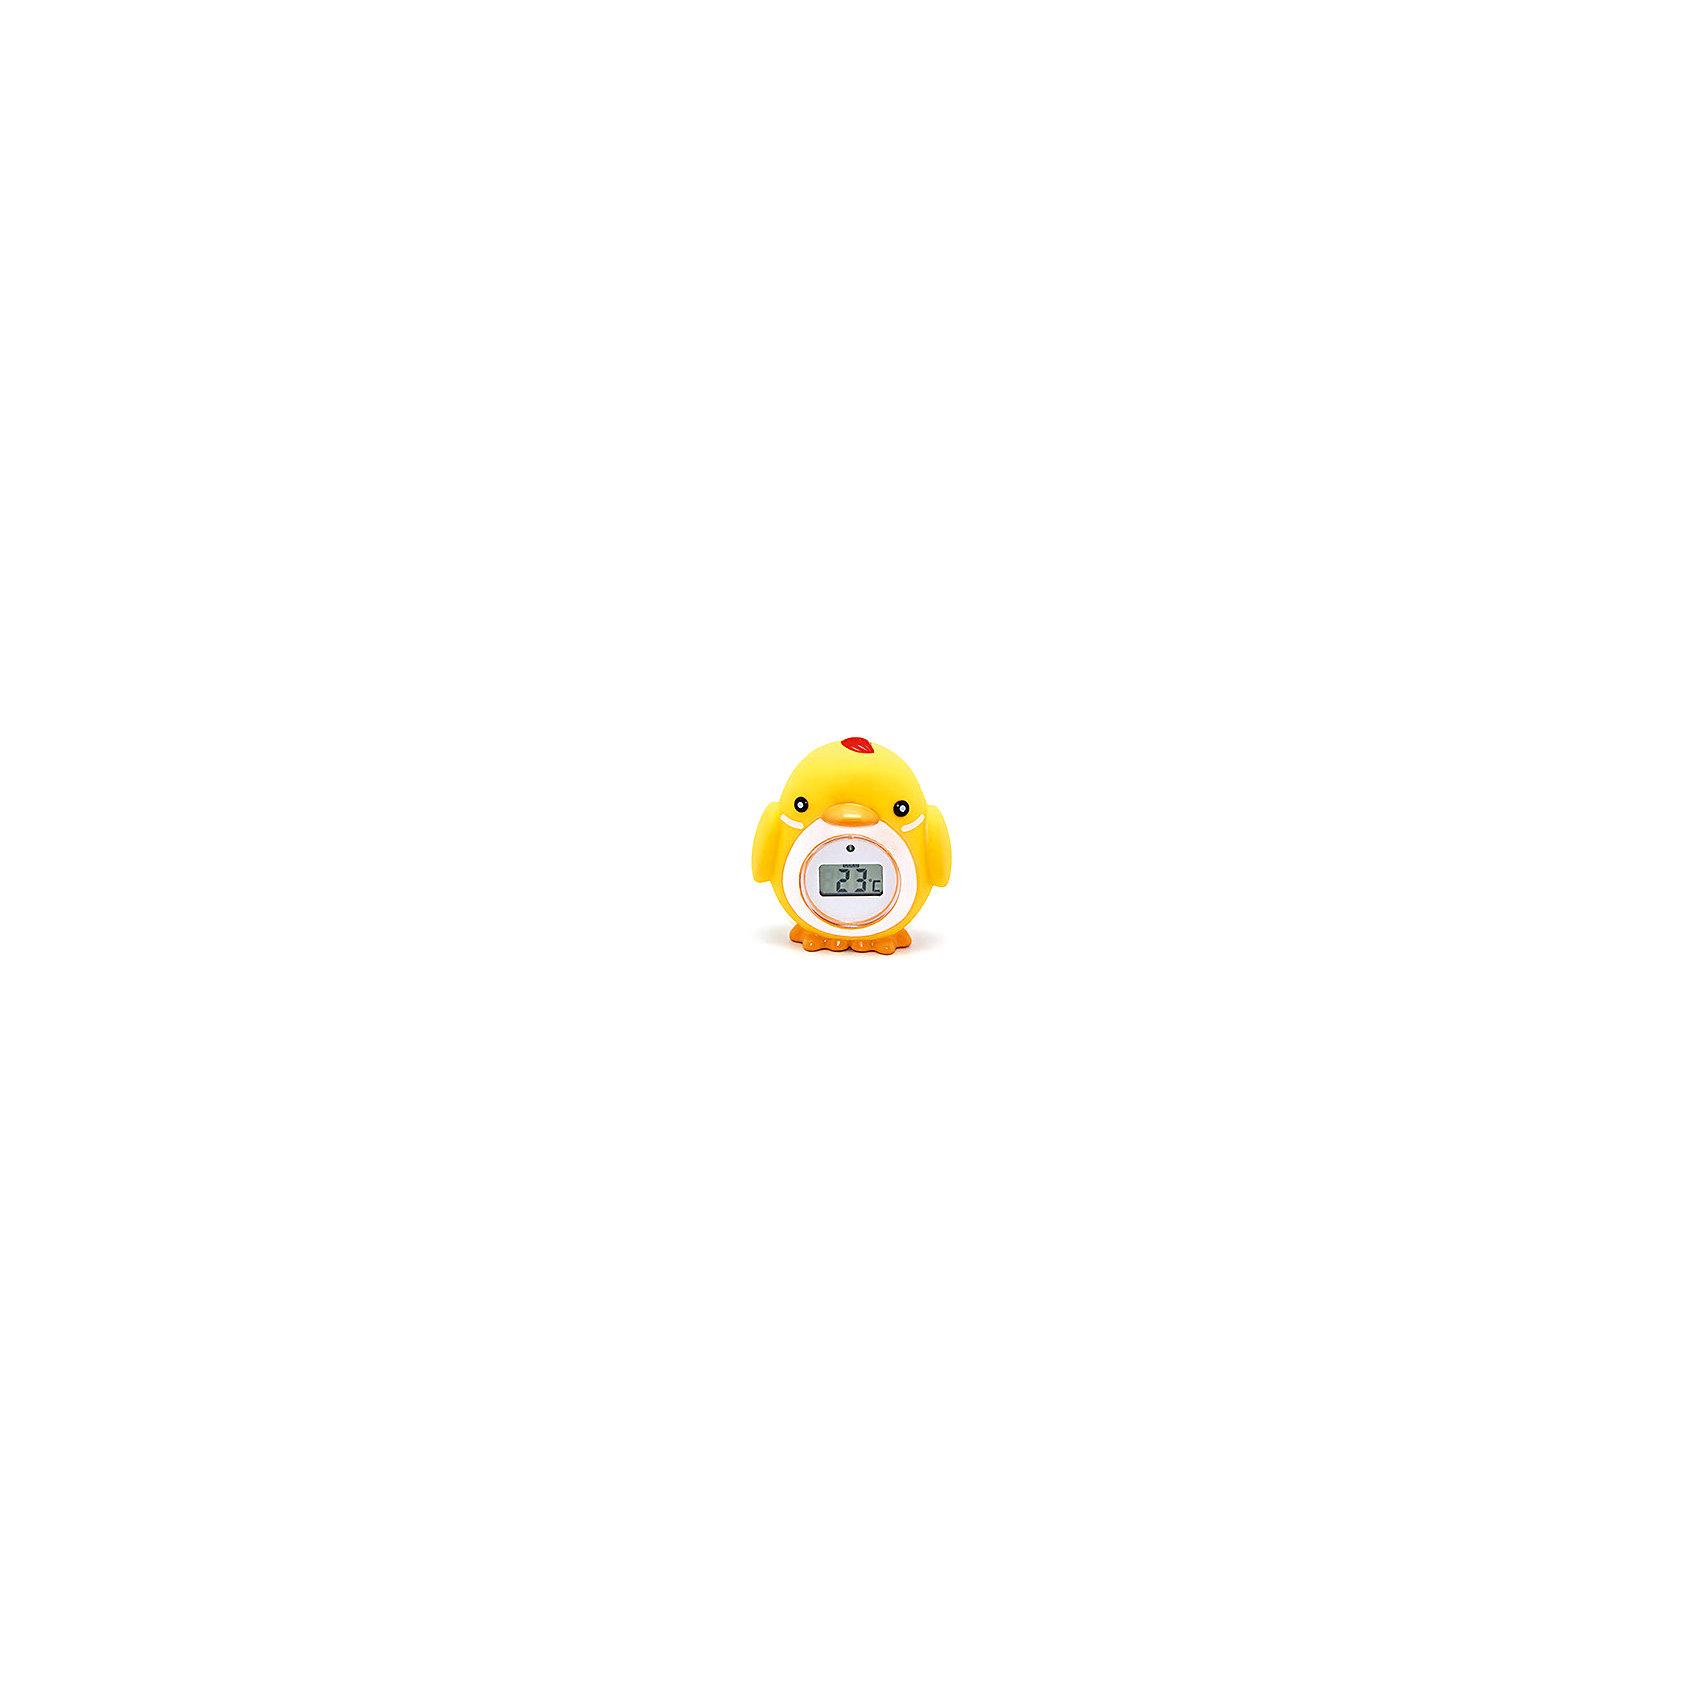 Термометр для воды Maman, цыпленок